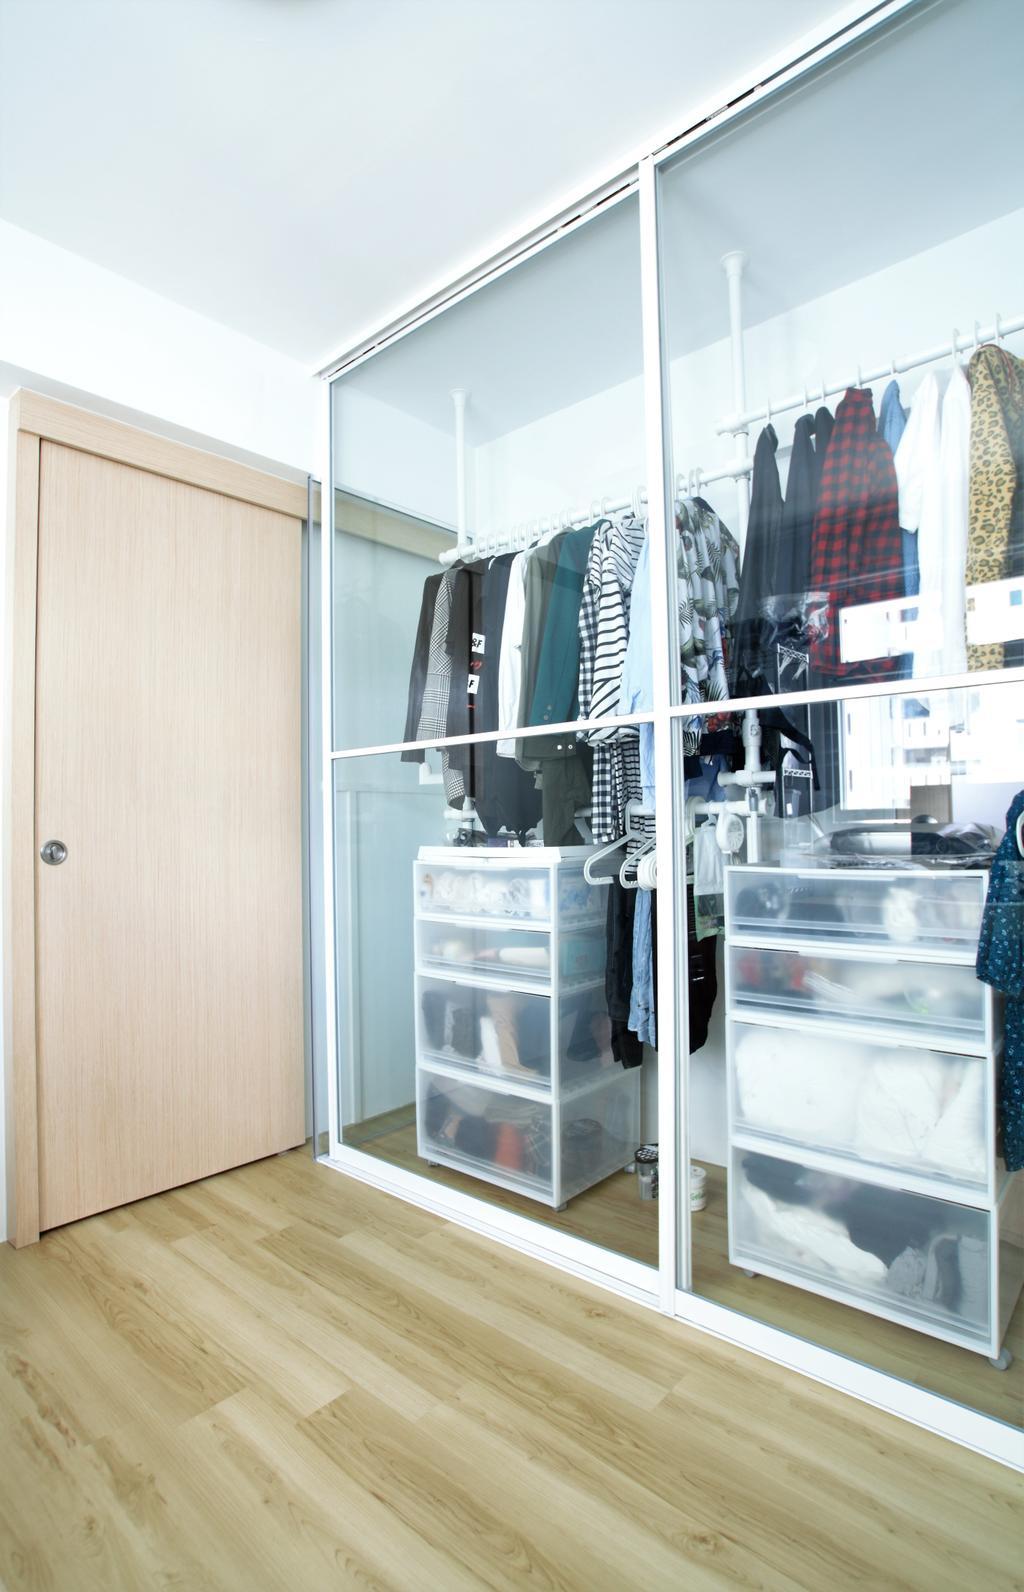 HDB, Telok Blangah, Interior Designer, Intrigue-d Design Consultancy, Appliance, Electrical Device, Oven